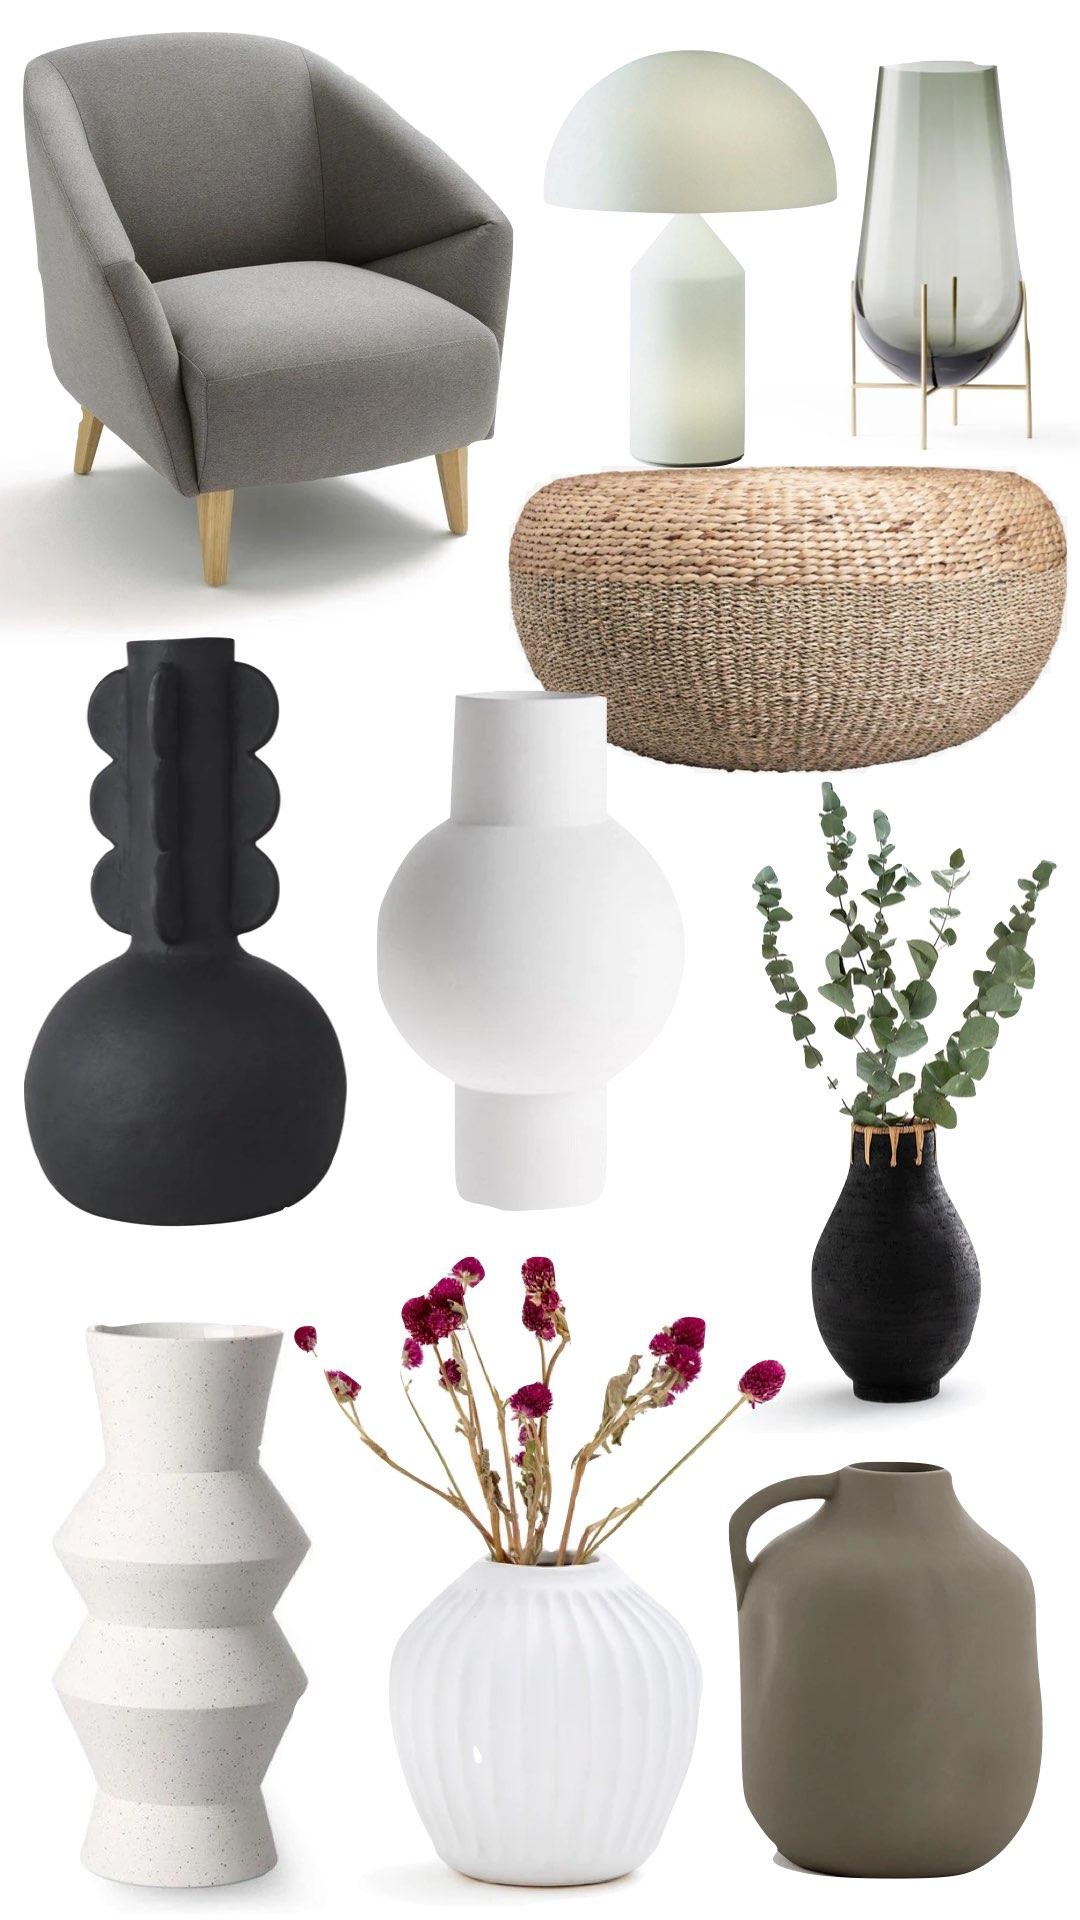 assortiment vase céramique artisanal blog déco clem around the corner